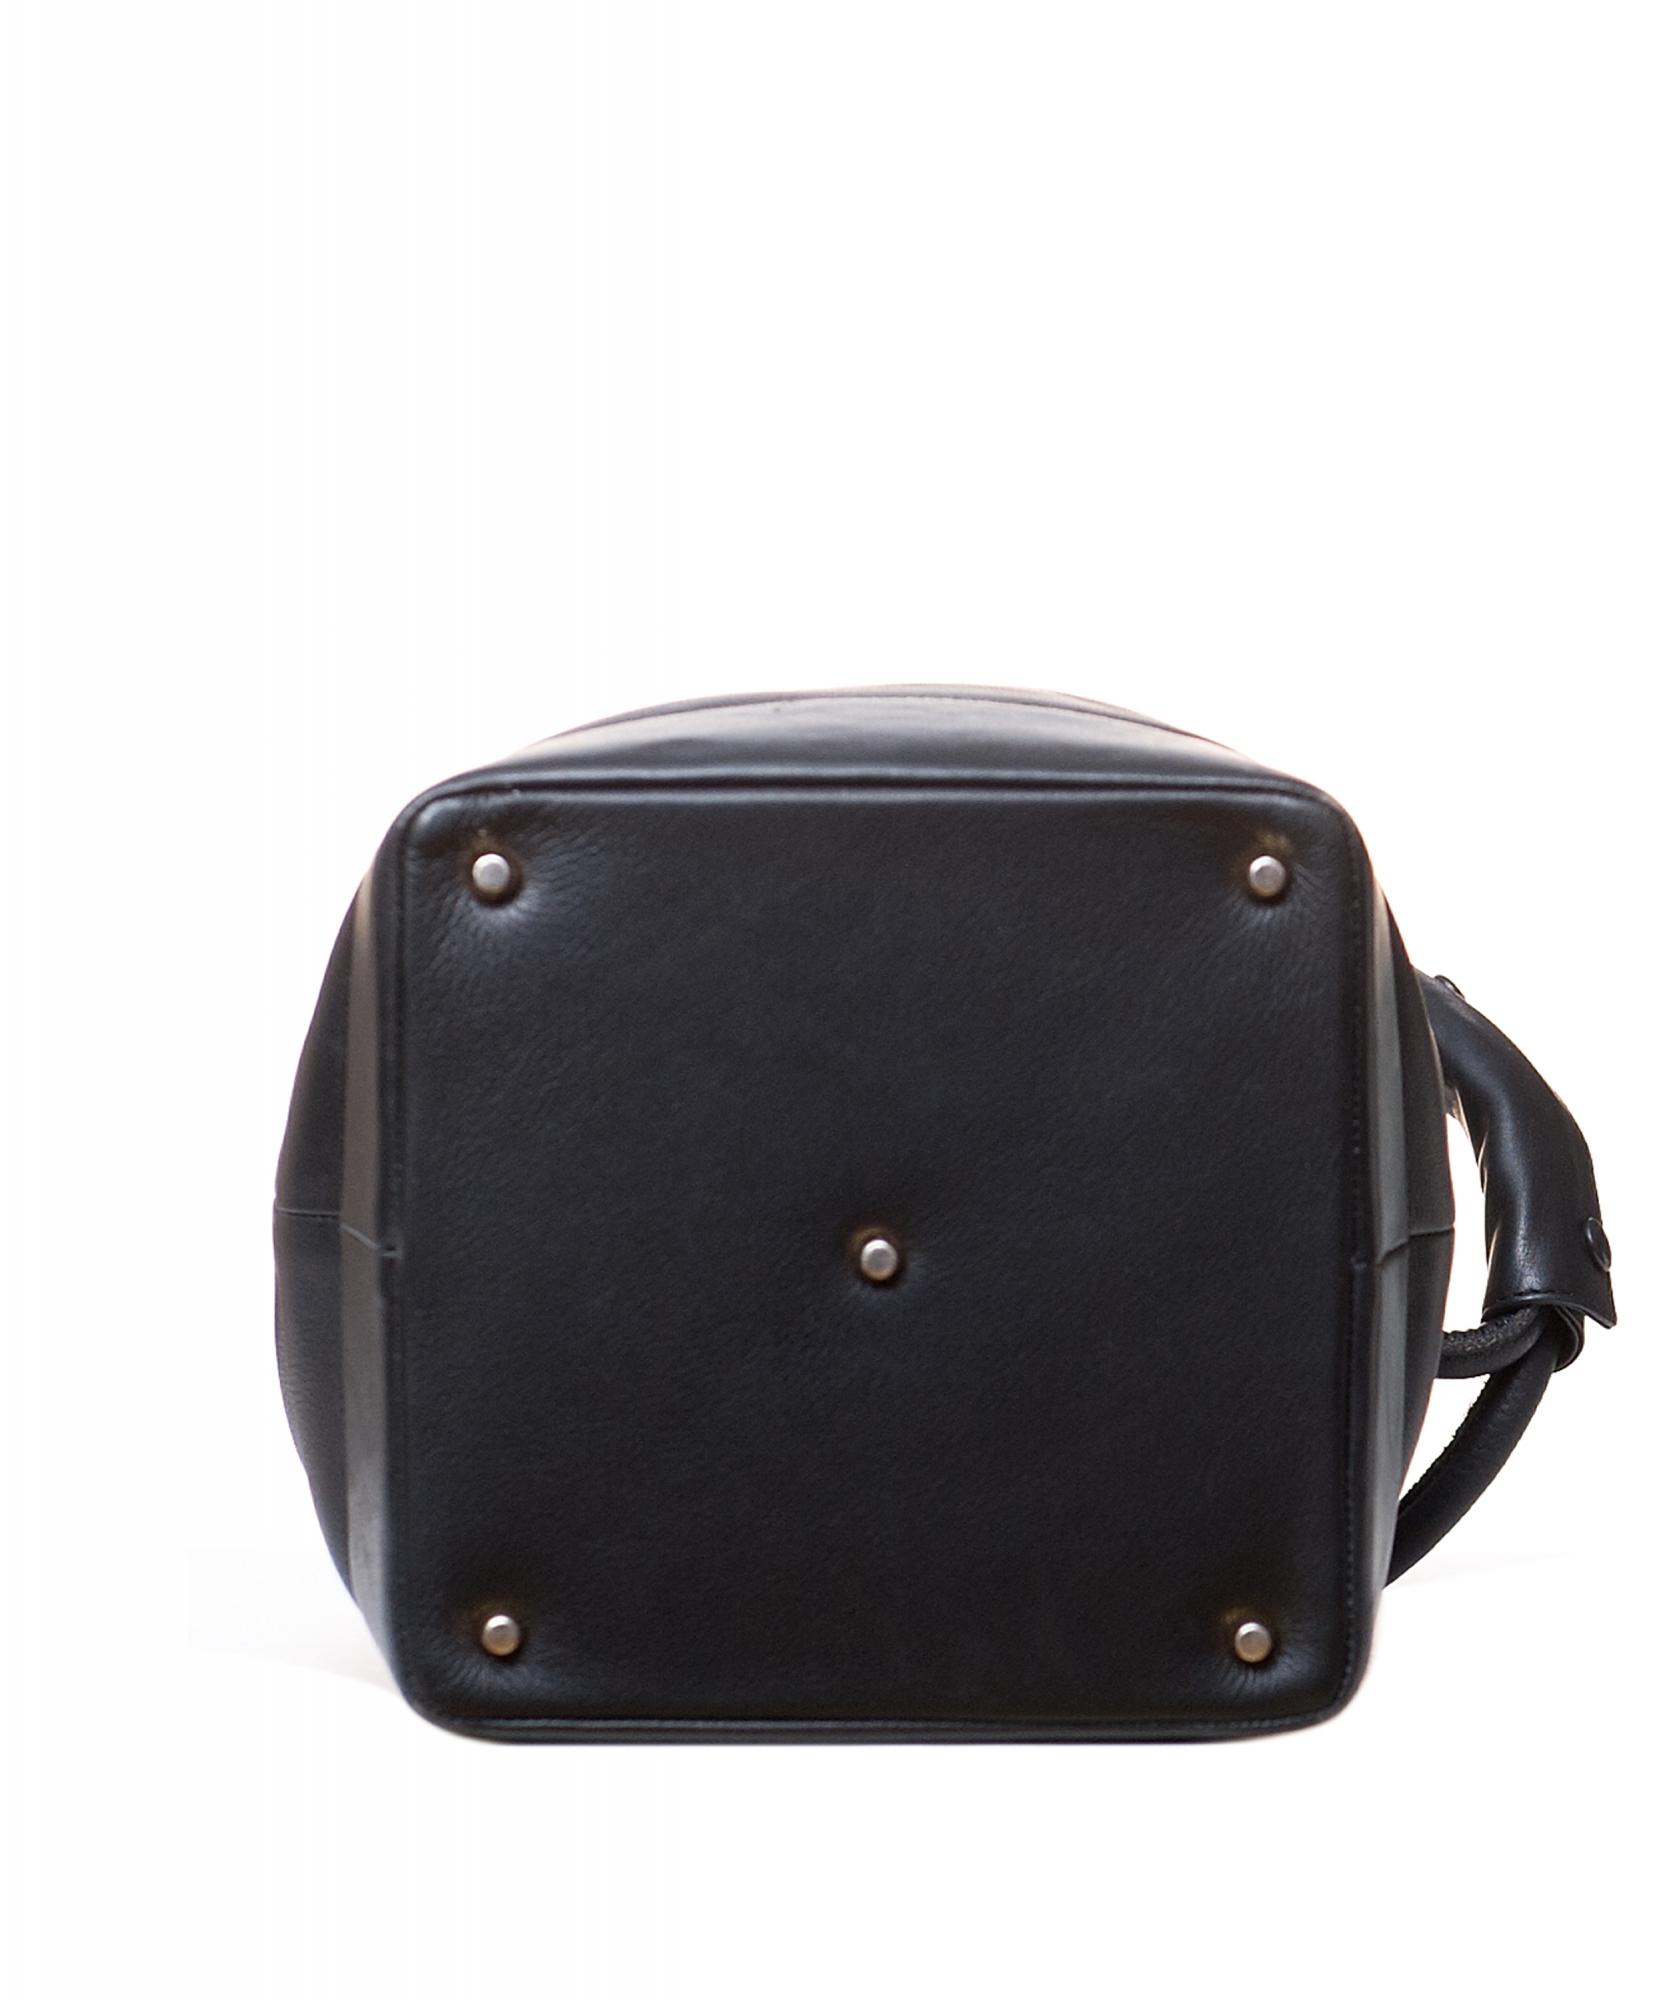 3b66360ab1 Gianni Versace Couture Black Leather Medusa Drawstring Bag   La Doyenne